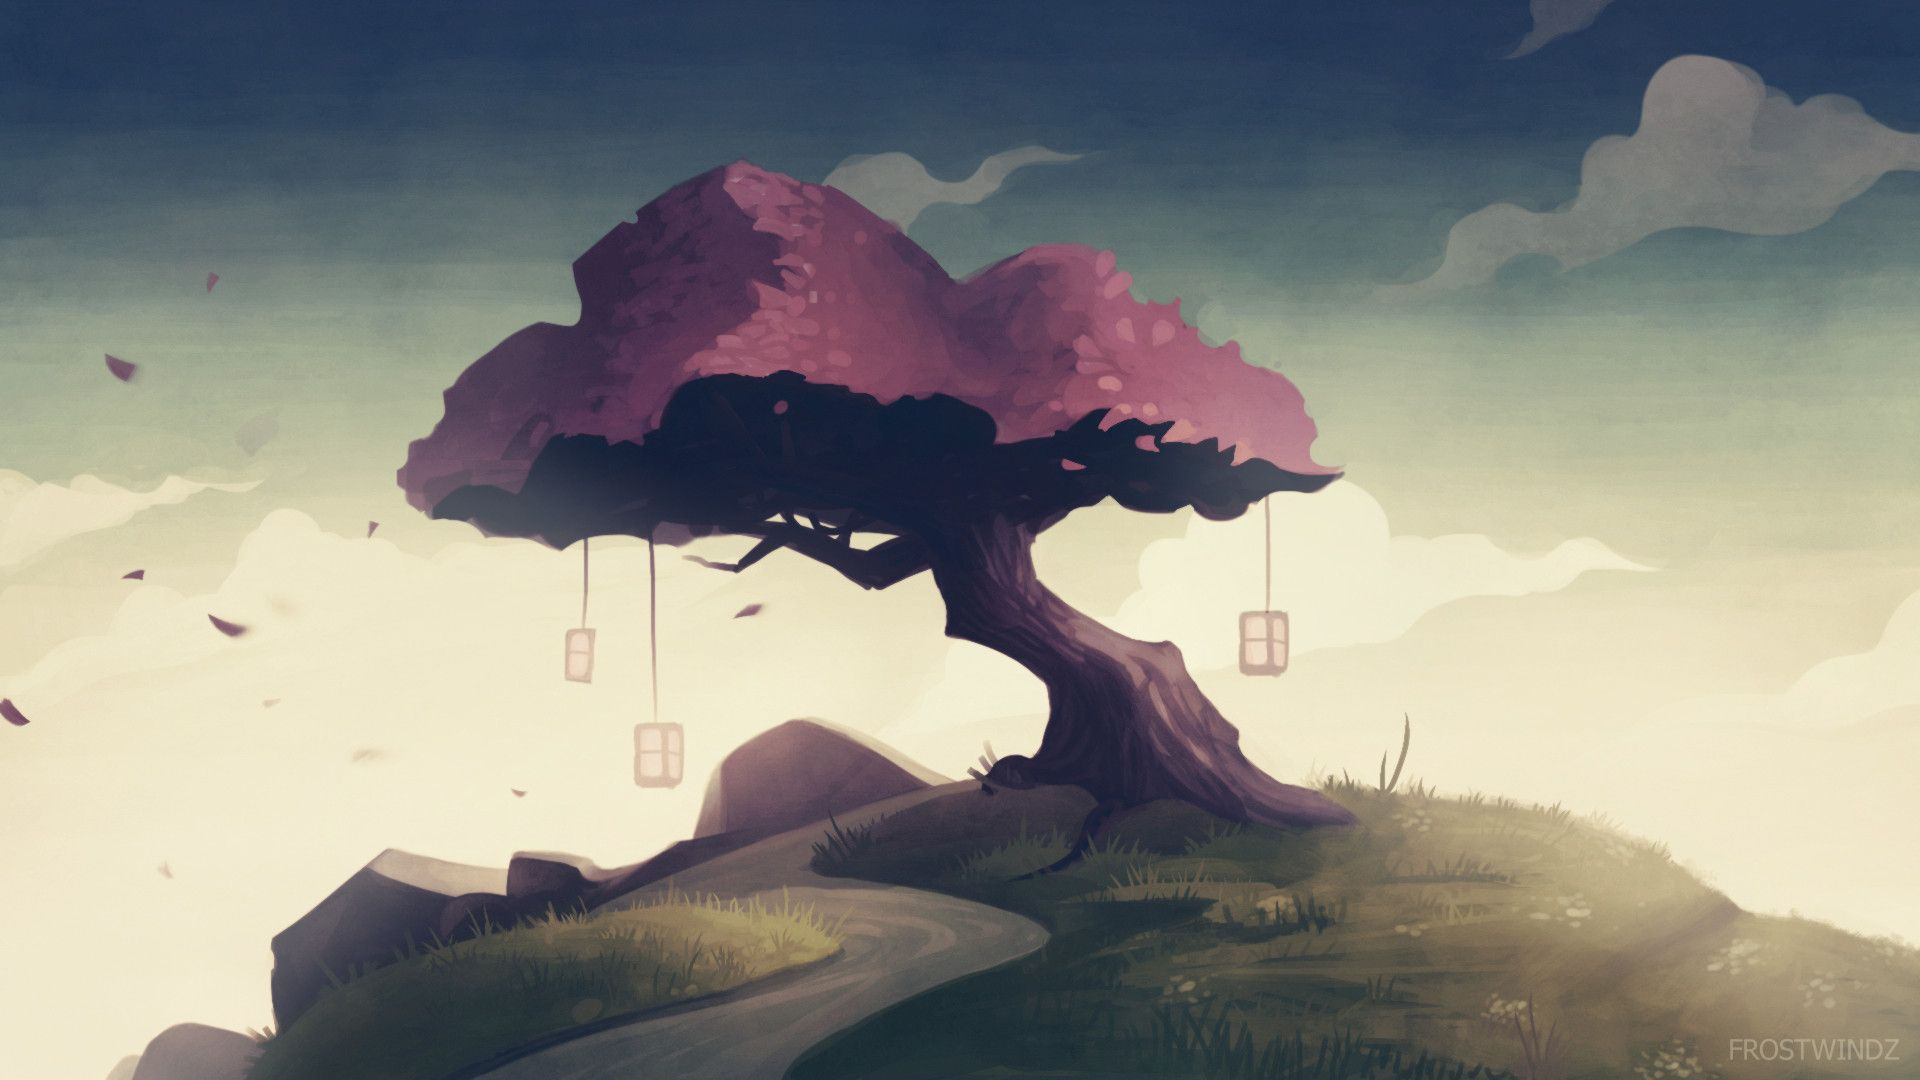 Sakura Tree 2 Radu Cosmin Alexandru Sakura Tree Tree Artwork Sakura